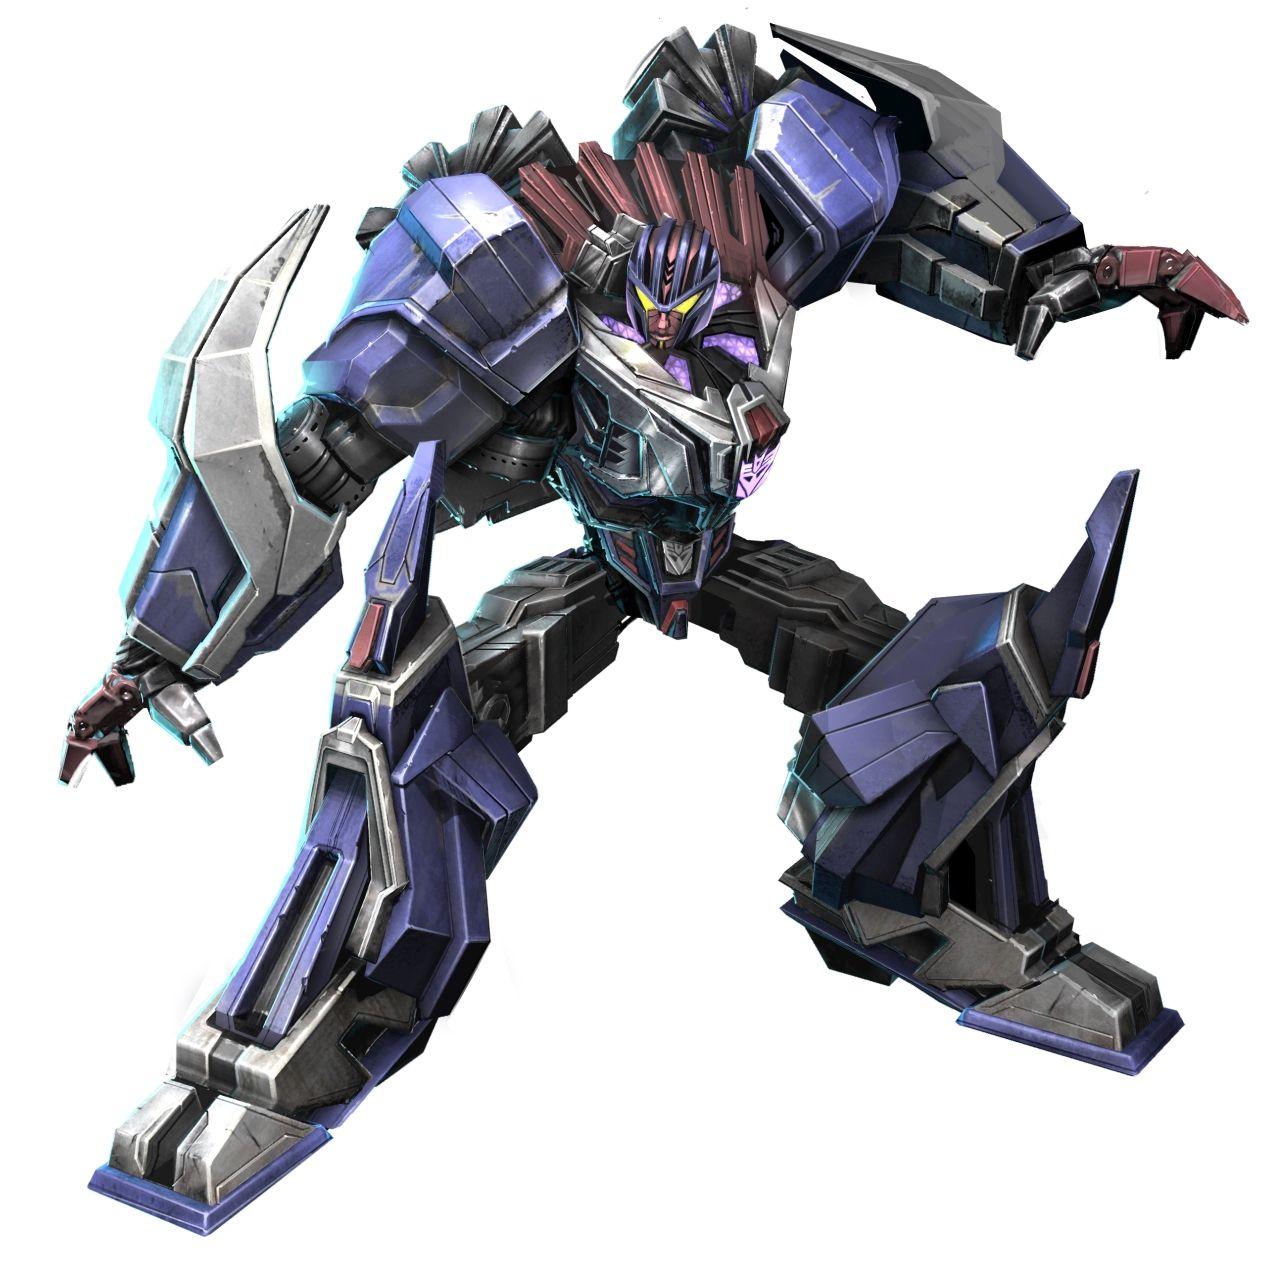 Transformer war for cybertron - ThingLink